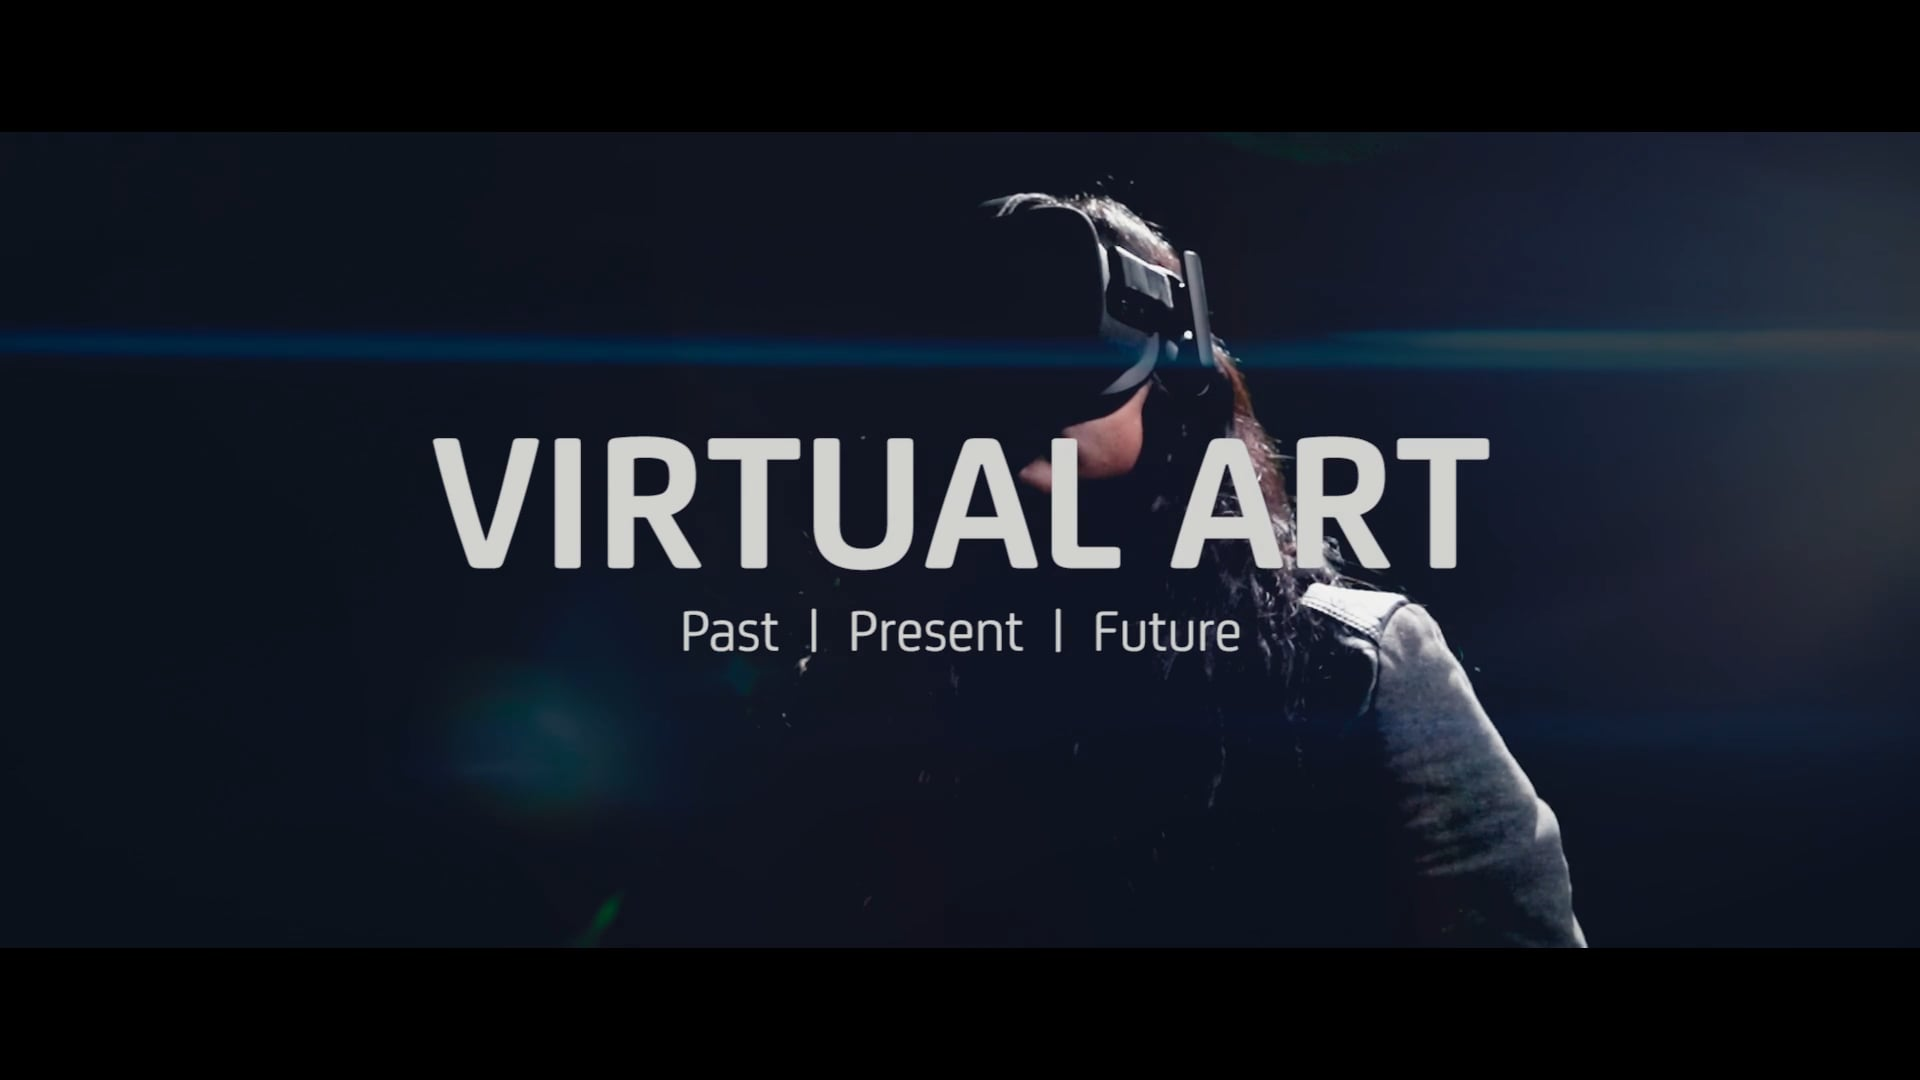 Virtual Art: Past | Present | Future Documentary